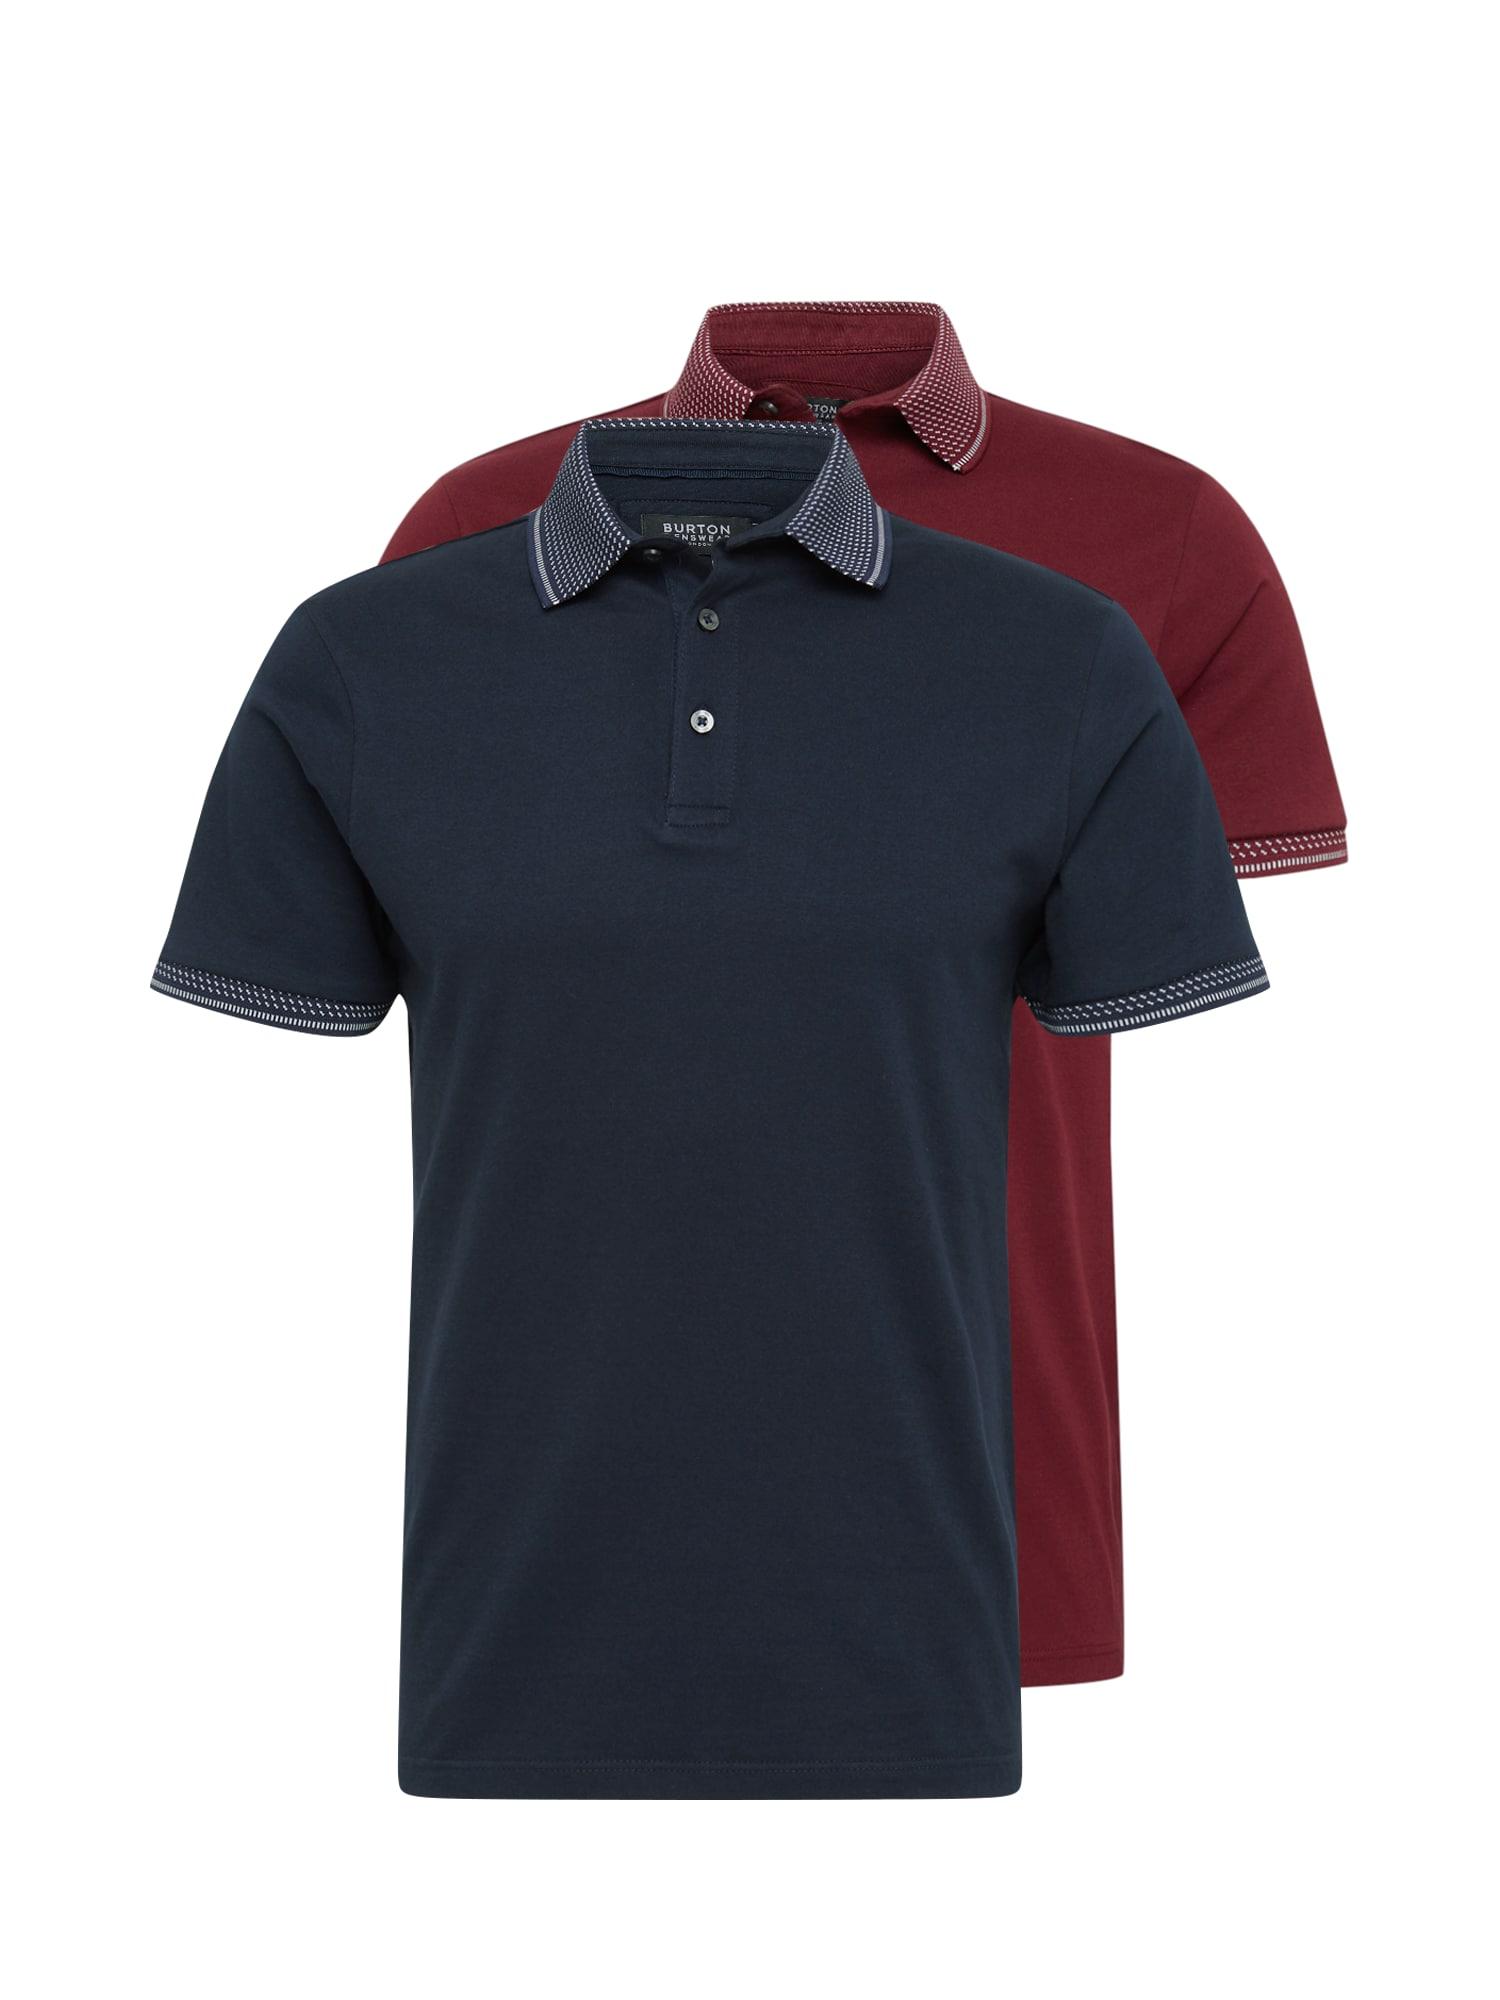 BURTON MENSWEAR LONDON Tričko  biela / burgundská / námornícka modrá